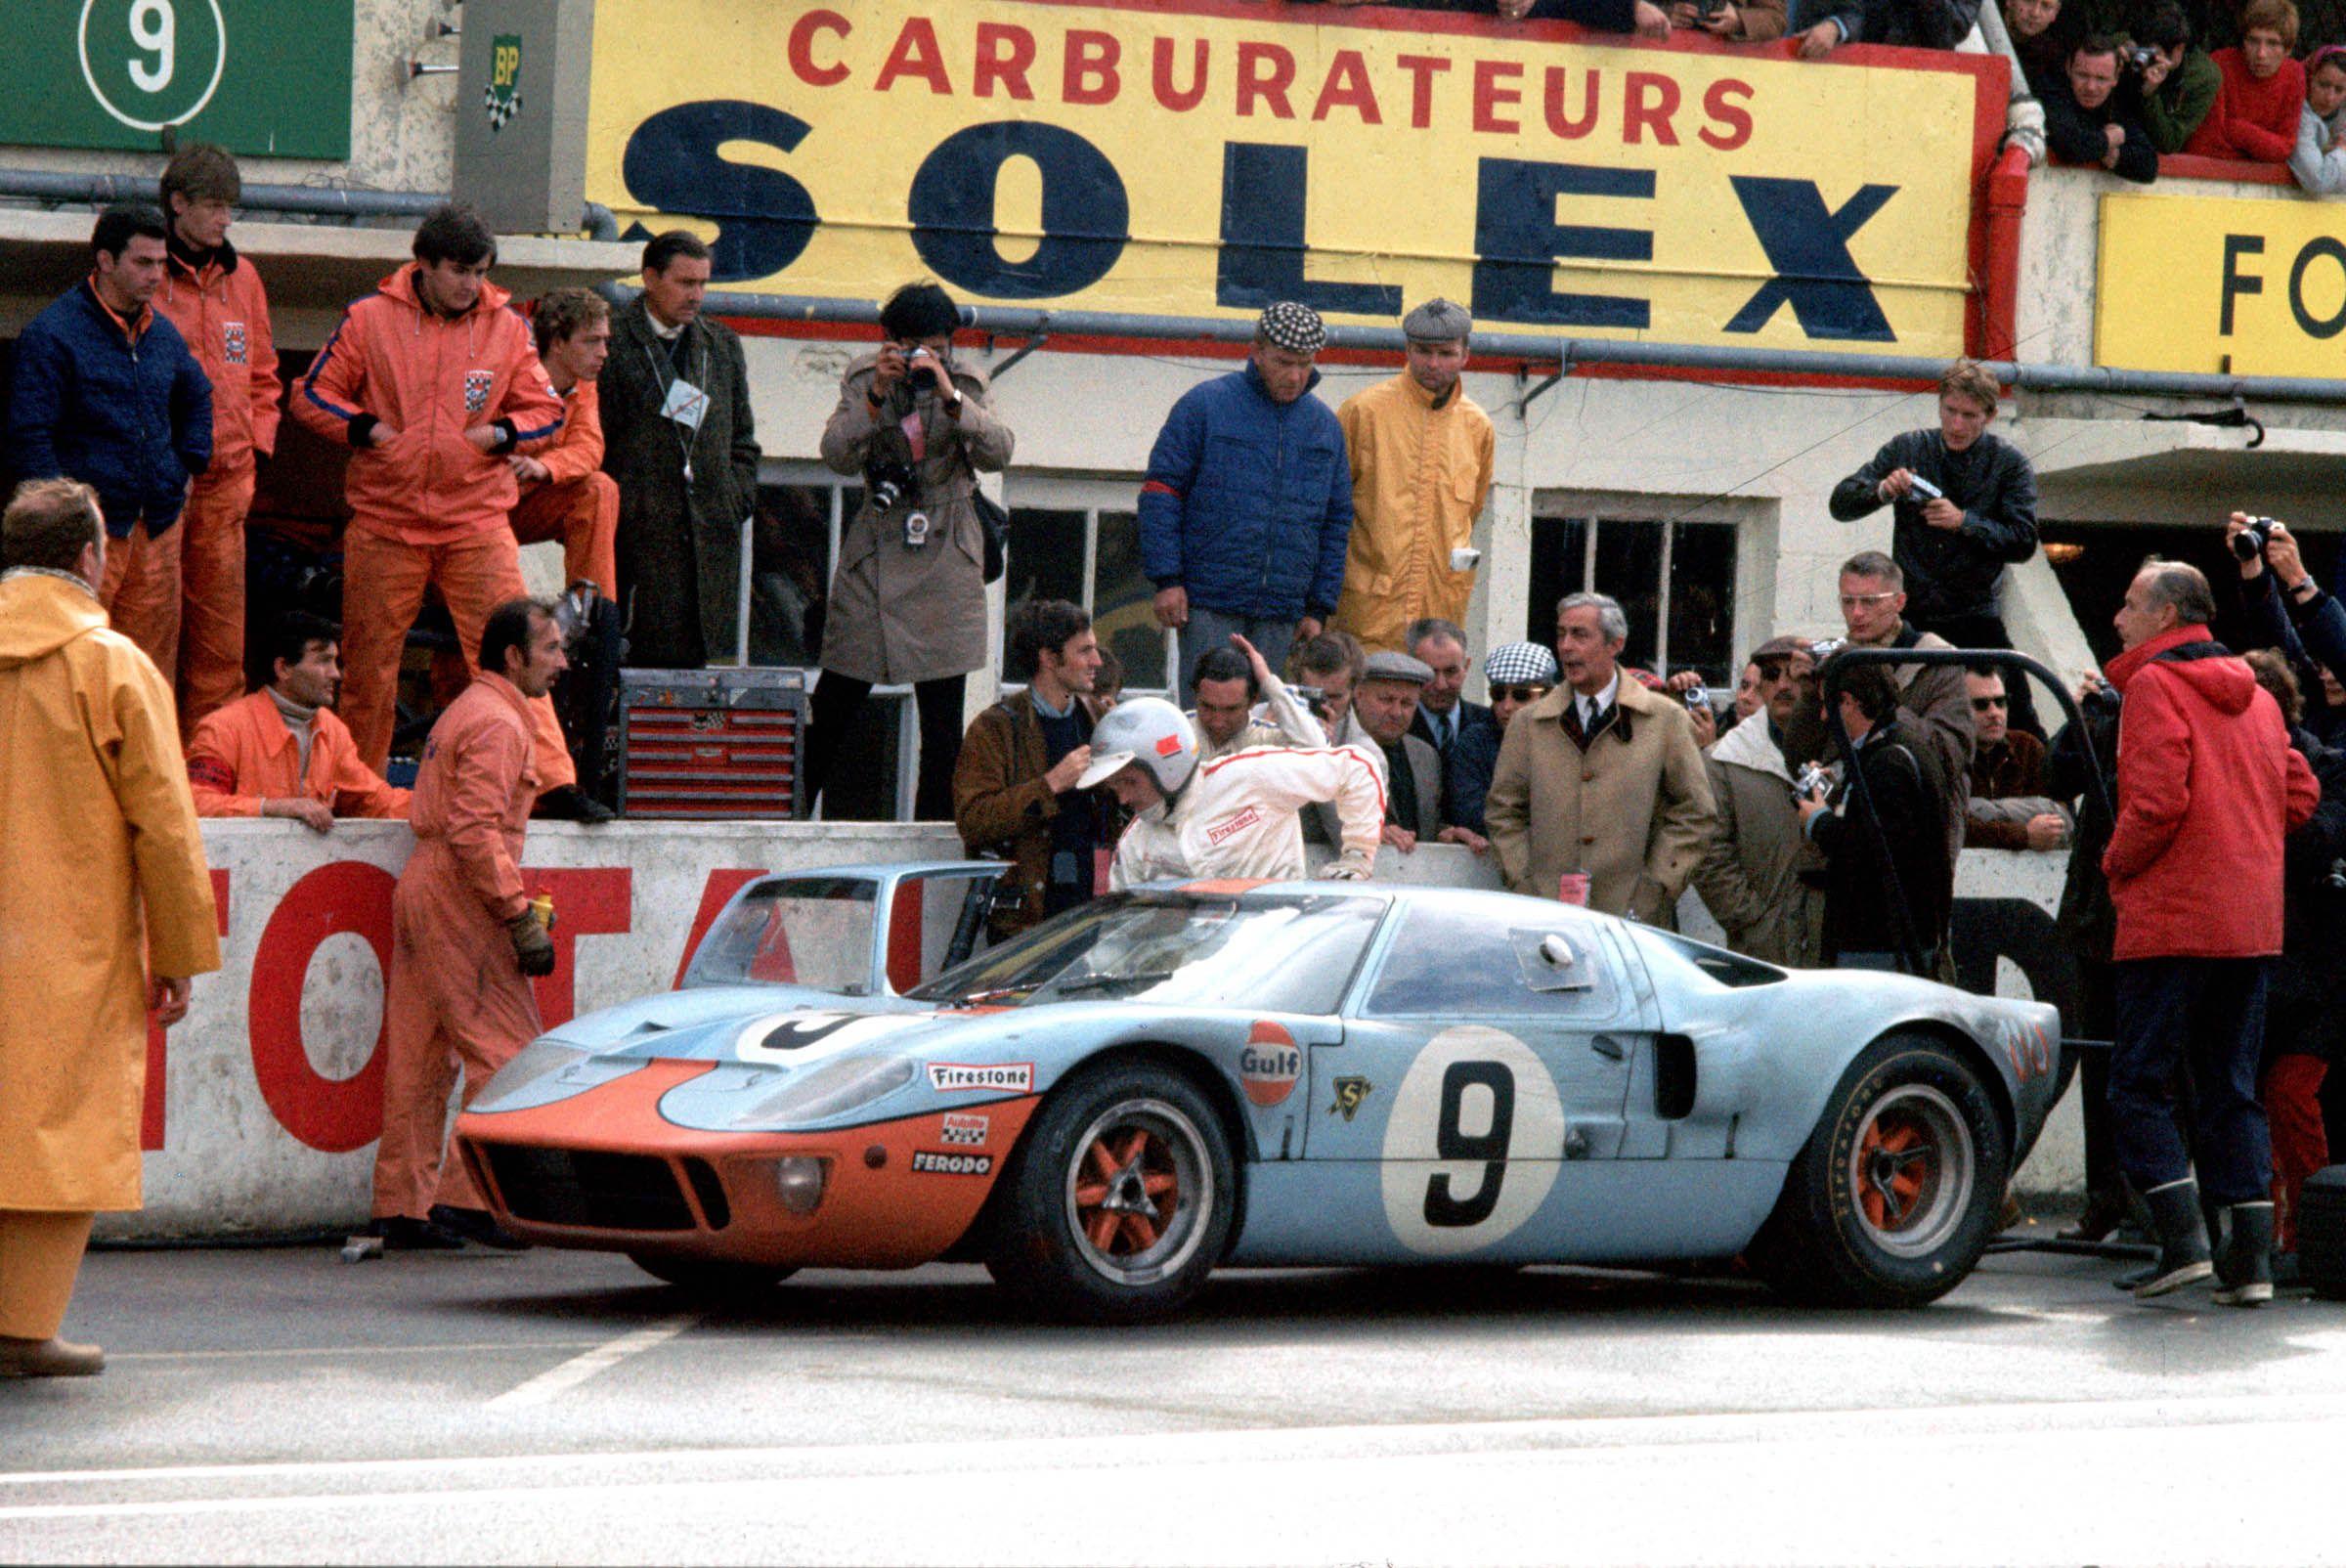 1968 Le Mans Ford Gt40 Ford Gt Gt40 Le Mans